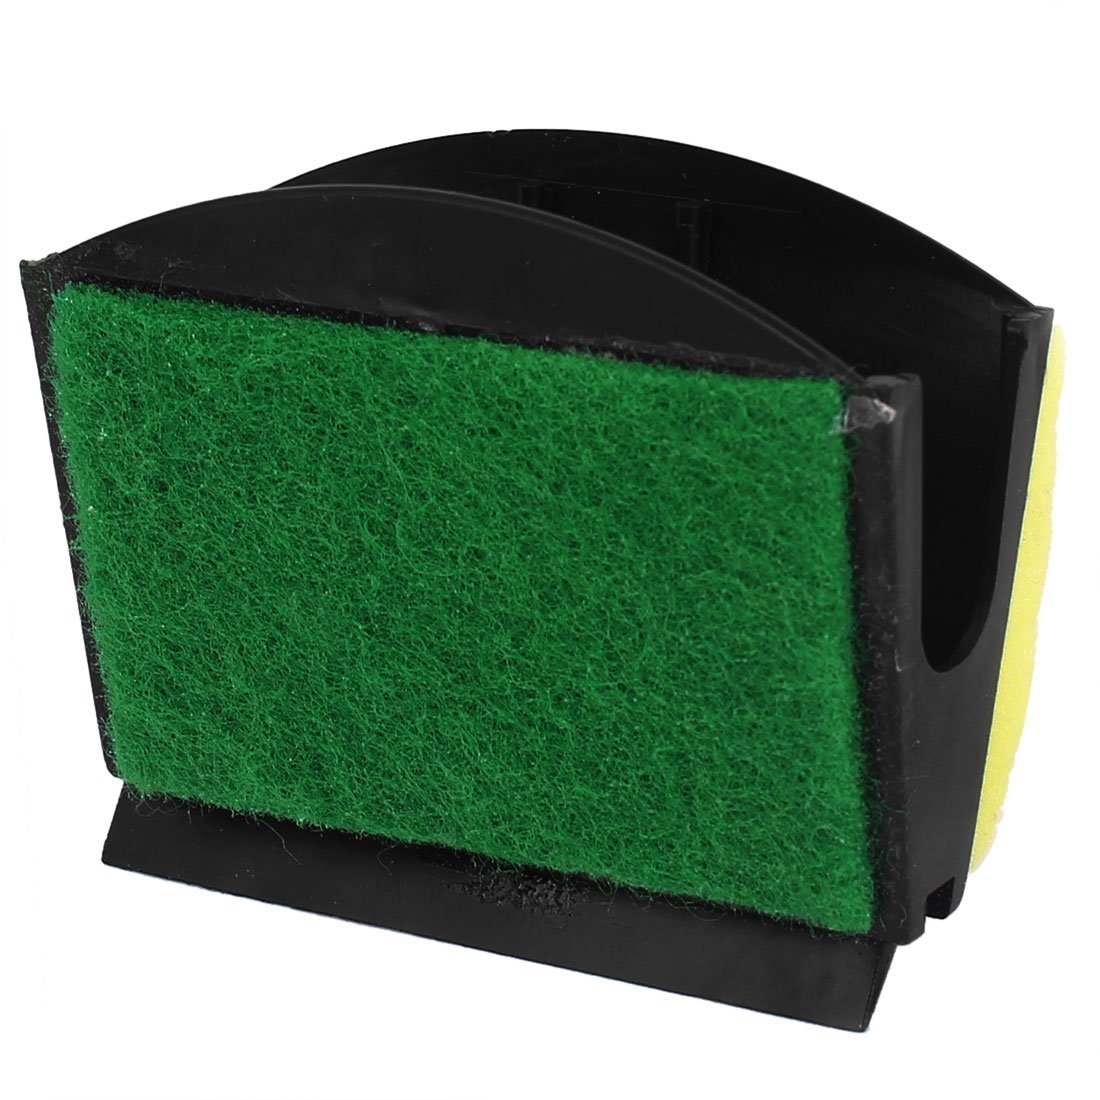 1Pc Sponge Aquarium Cleaner Brush Cleaning Tool Replacement Yellow Green